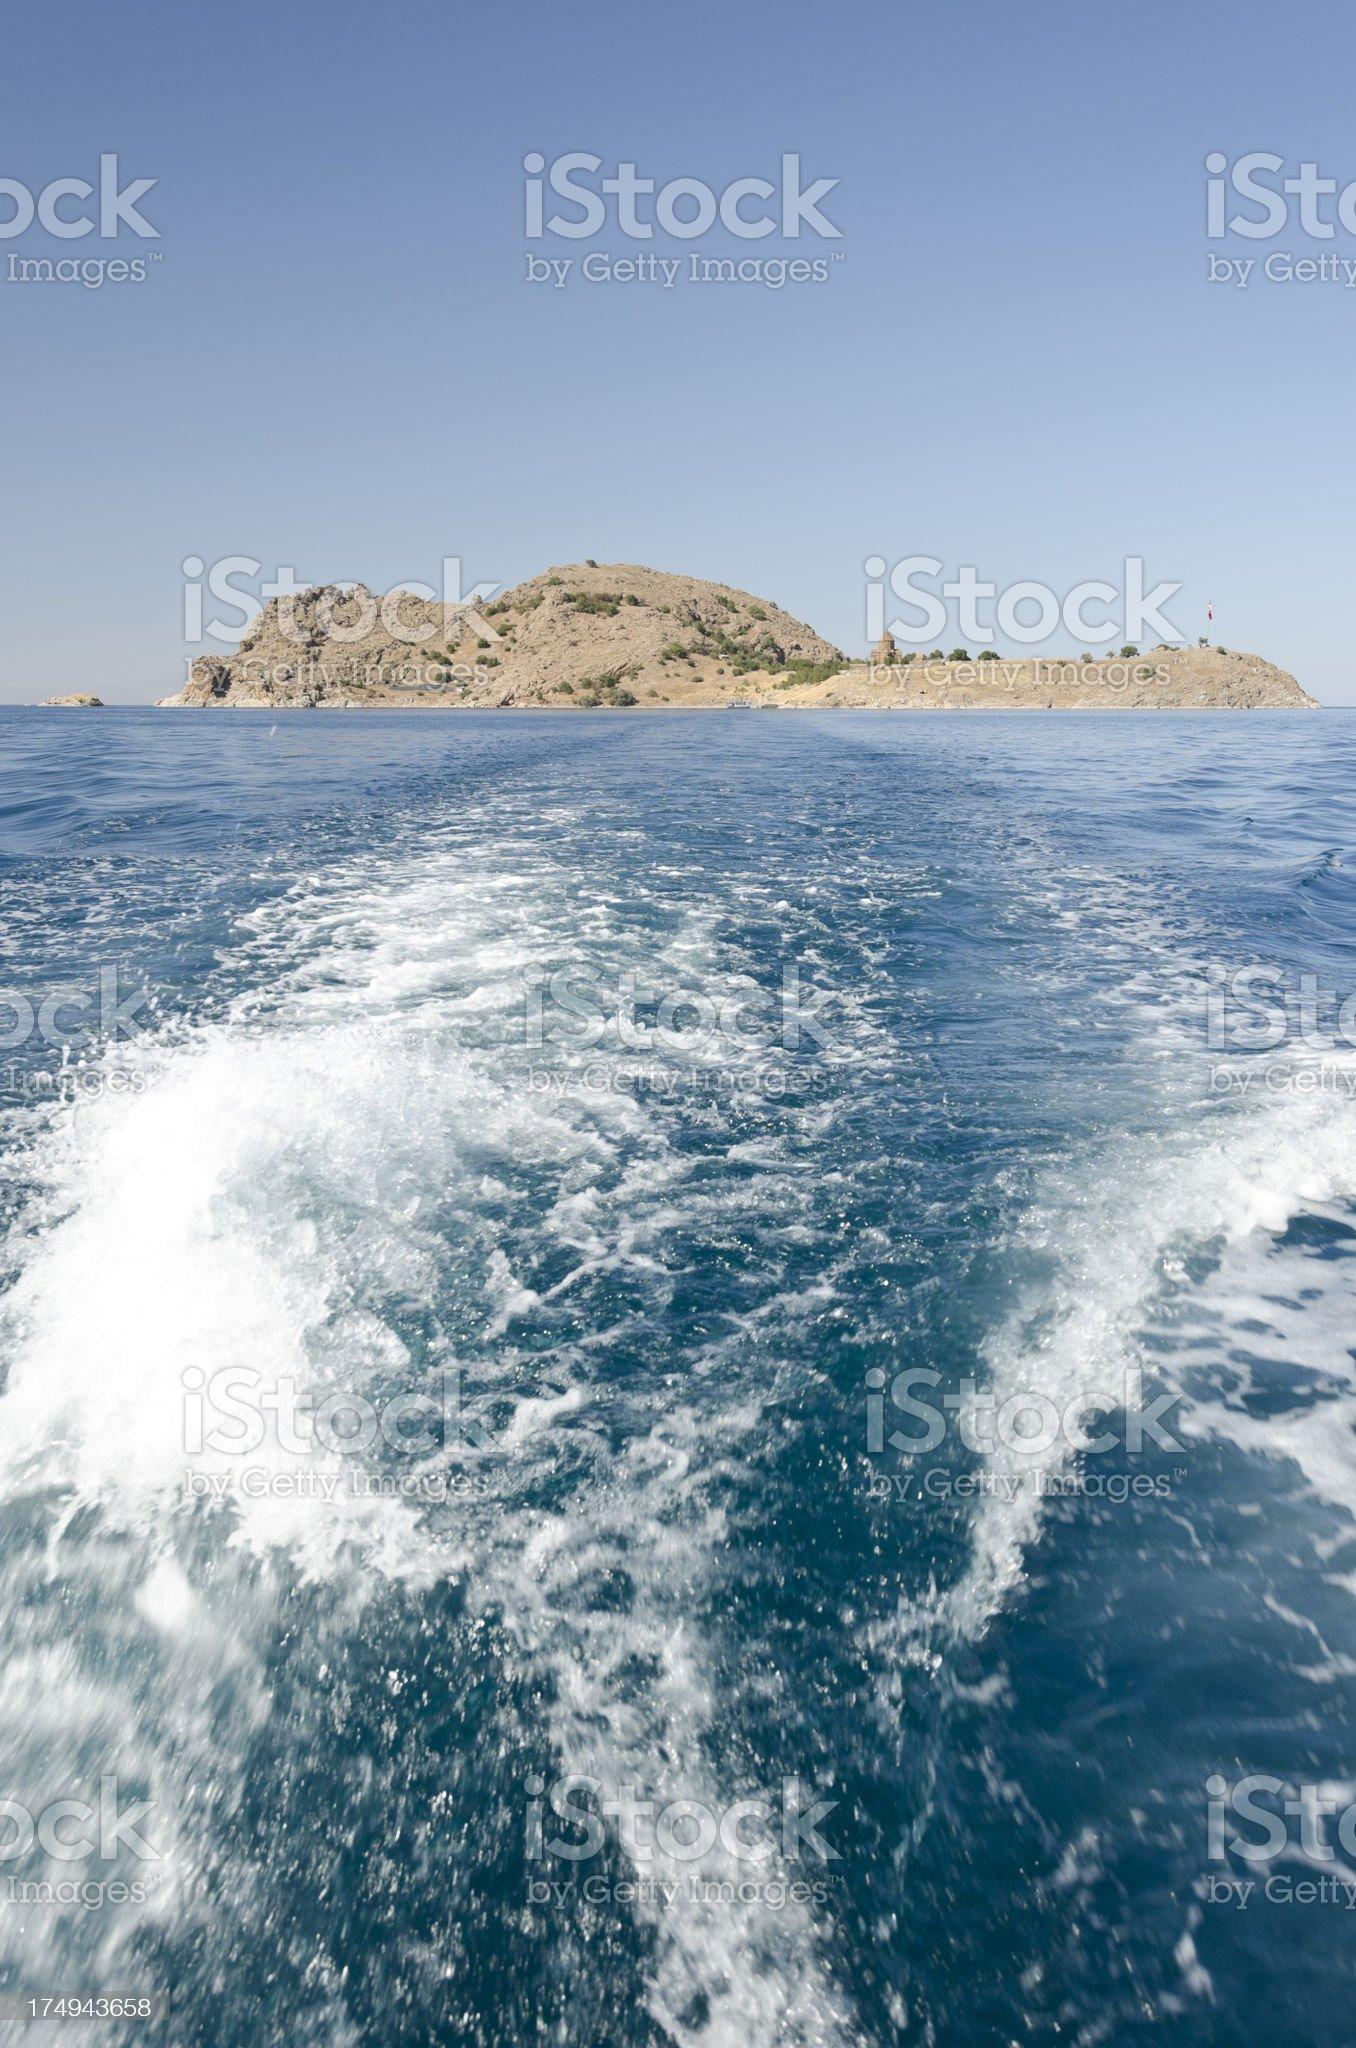 Akdamar Adasi Akhtamar Island royalty-free stock photo